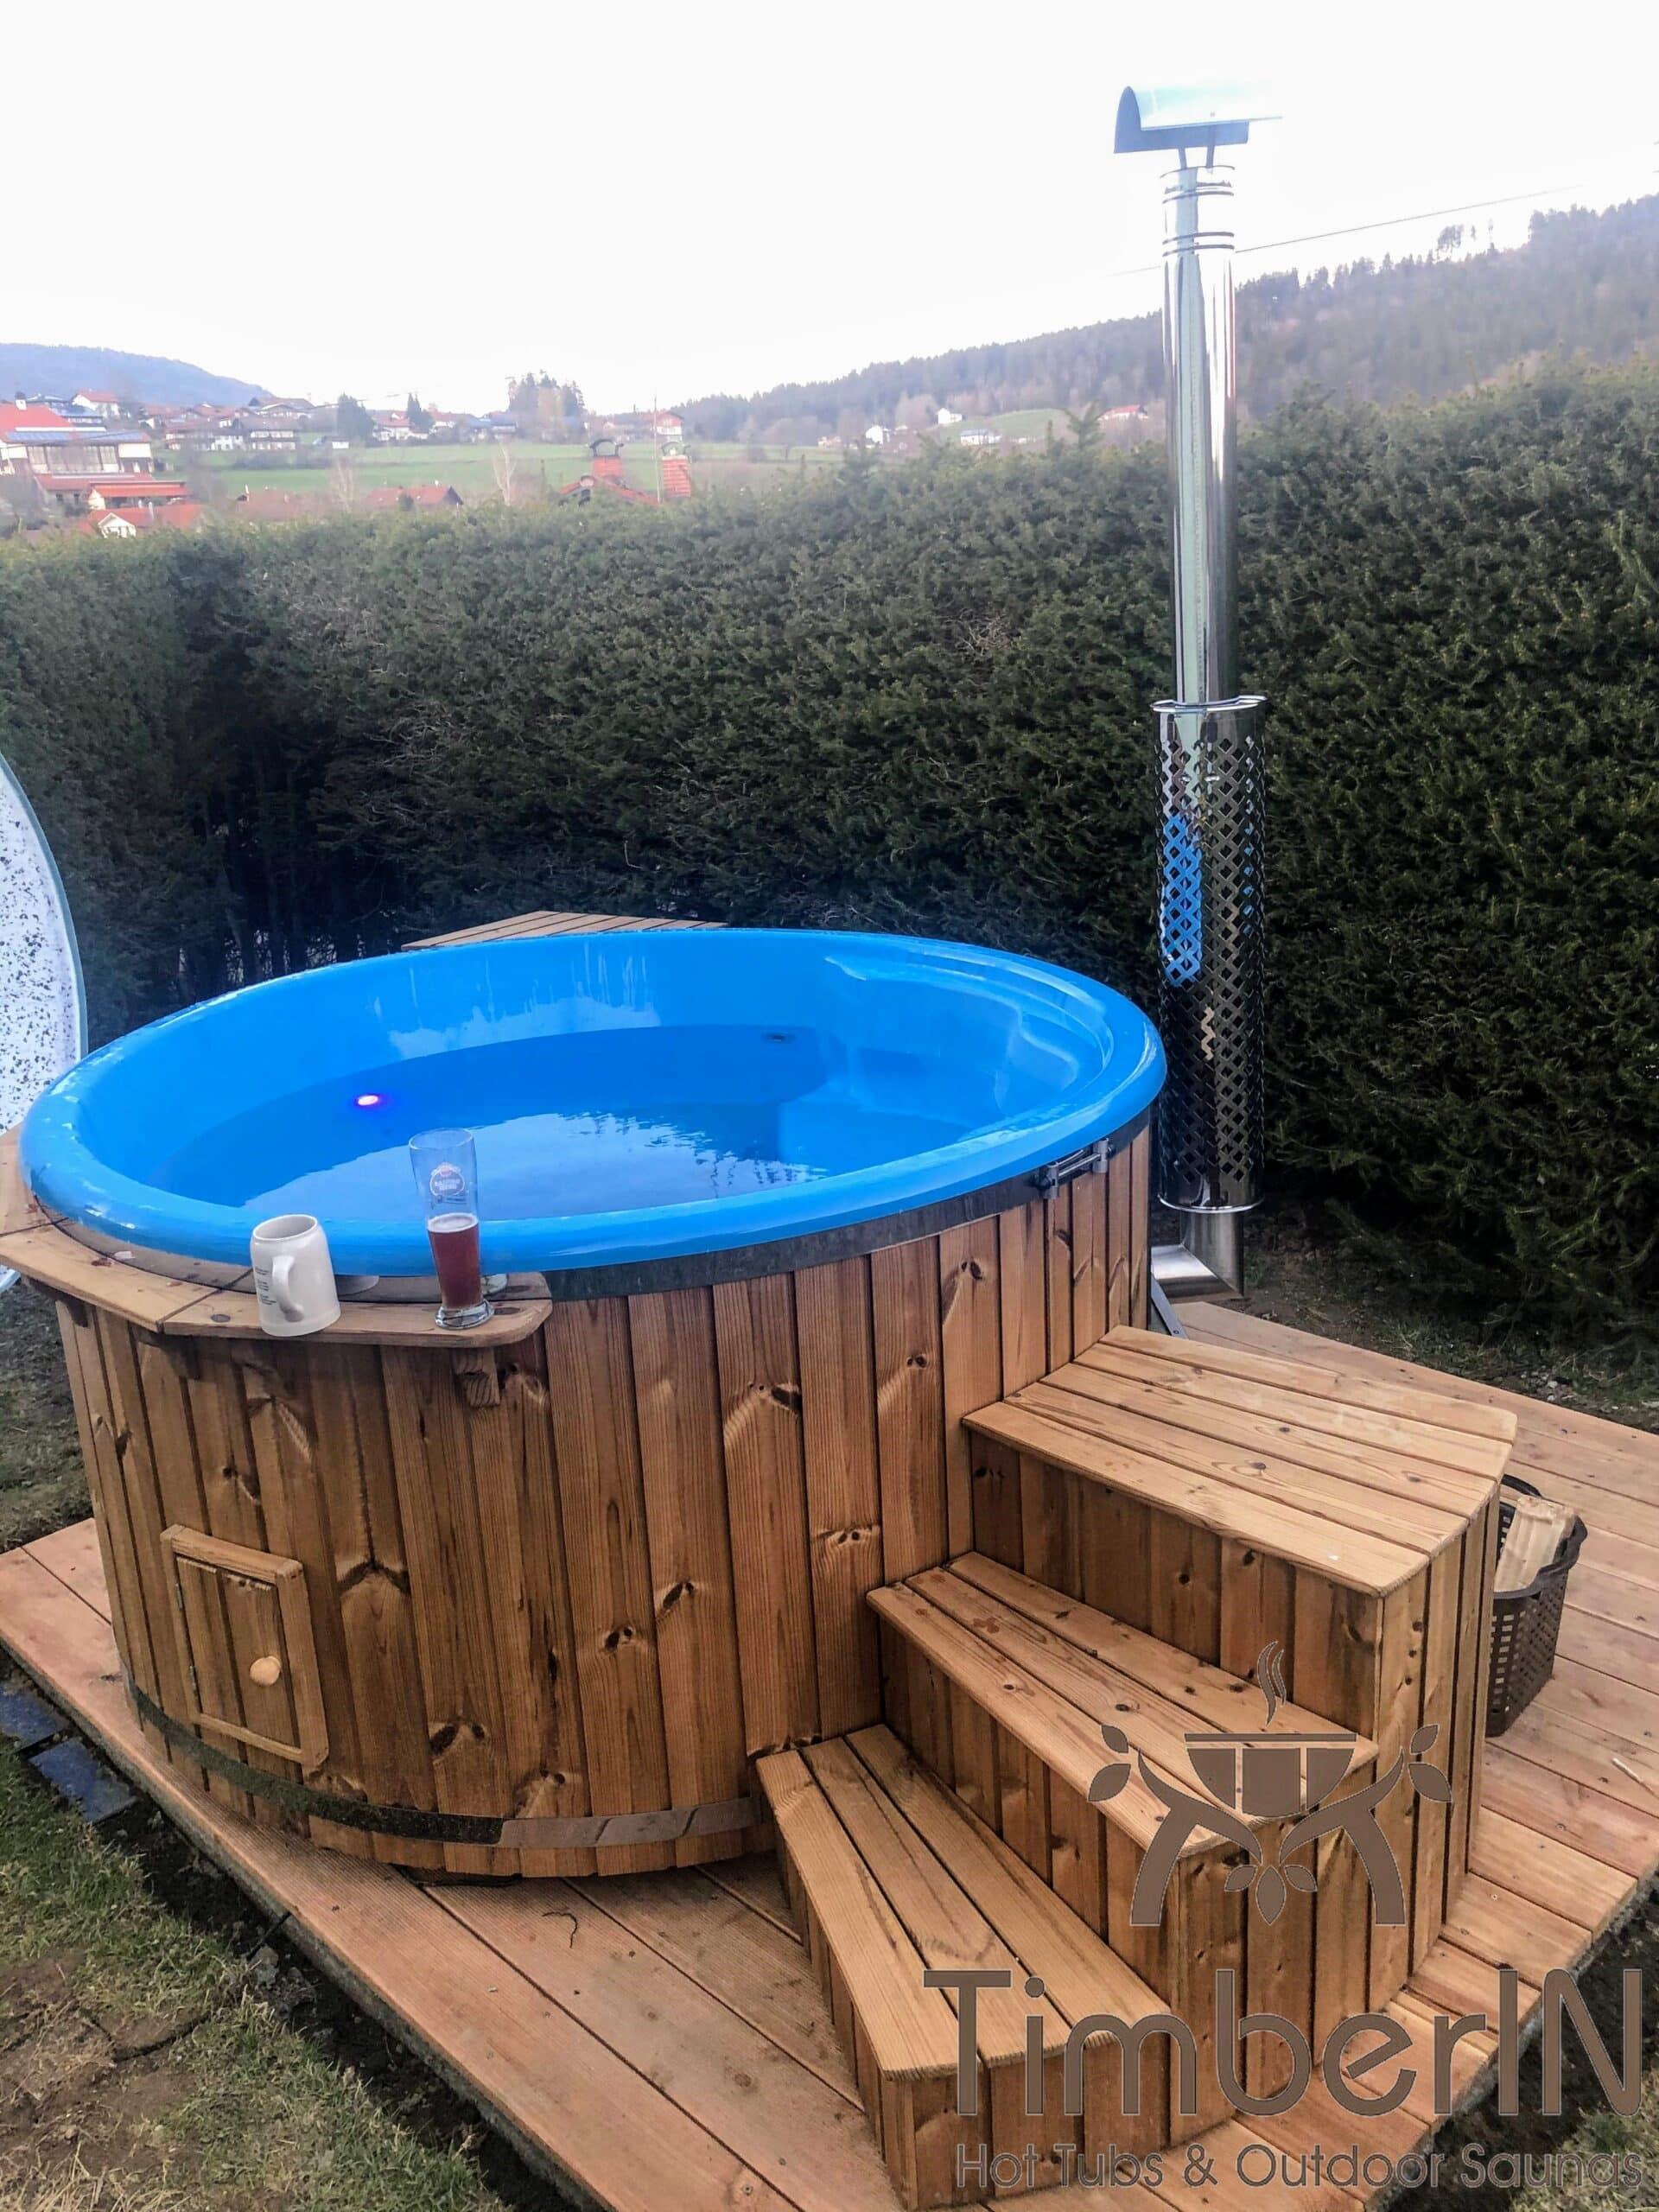 Badetonne Badebottich Hot Tube GFK mit Whirlpoolfunktion 2 4 scaled